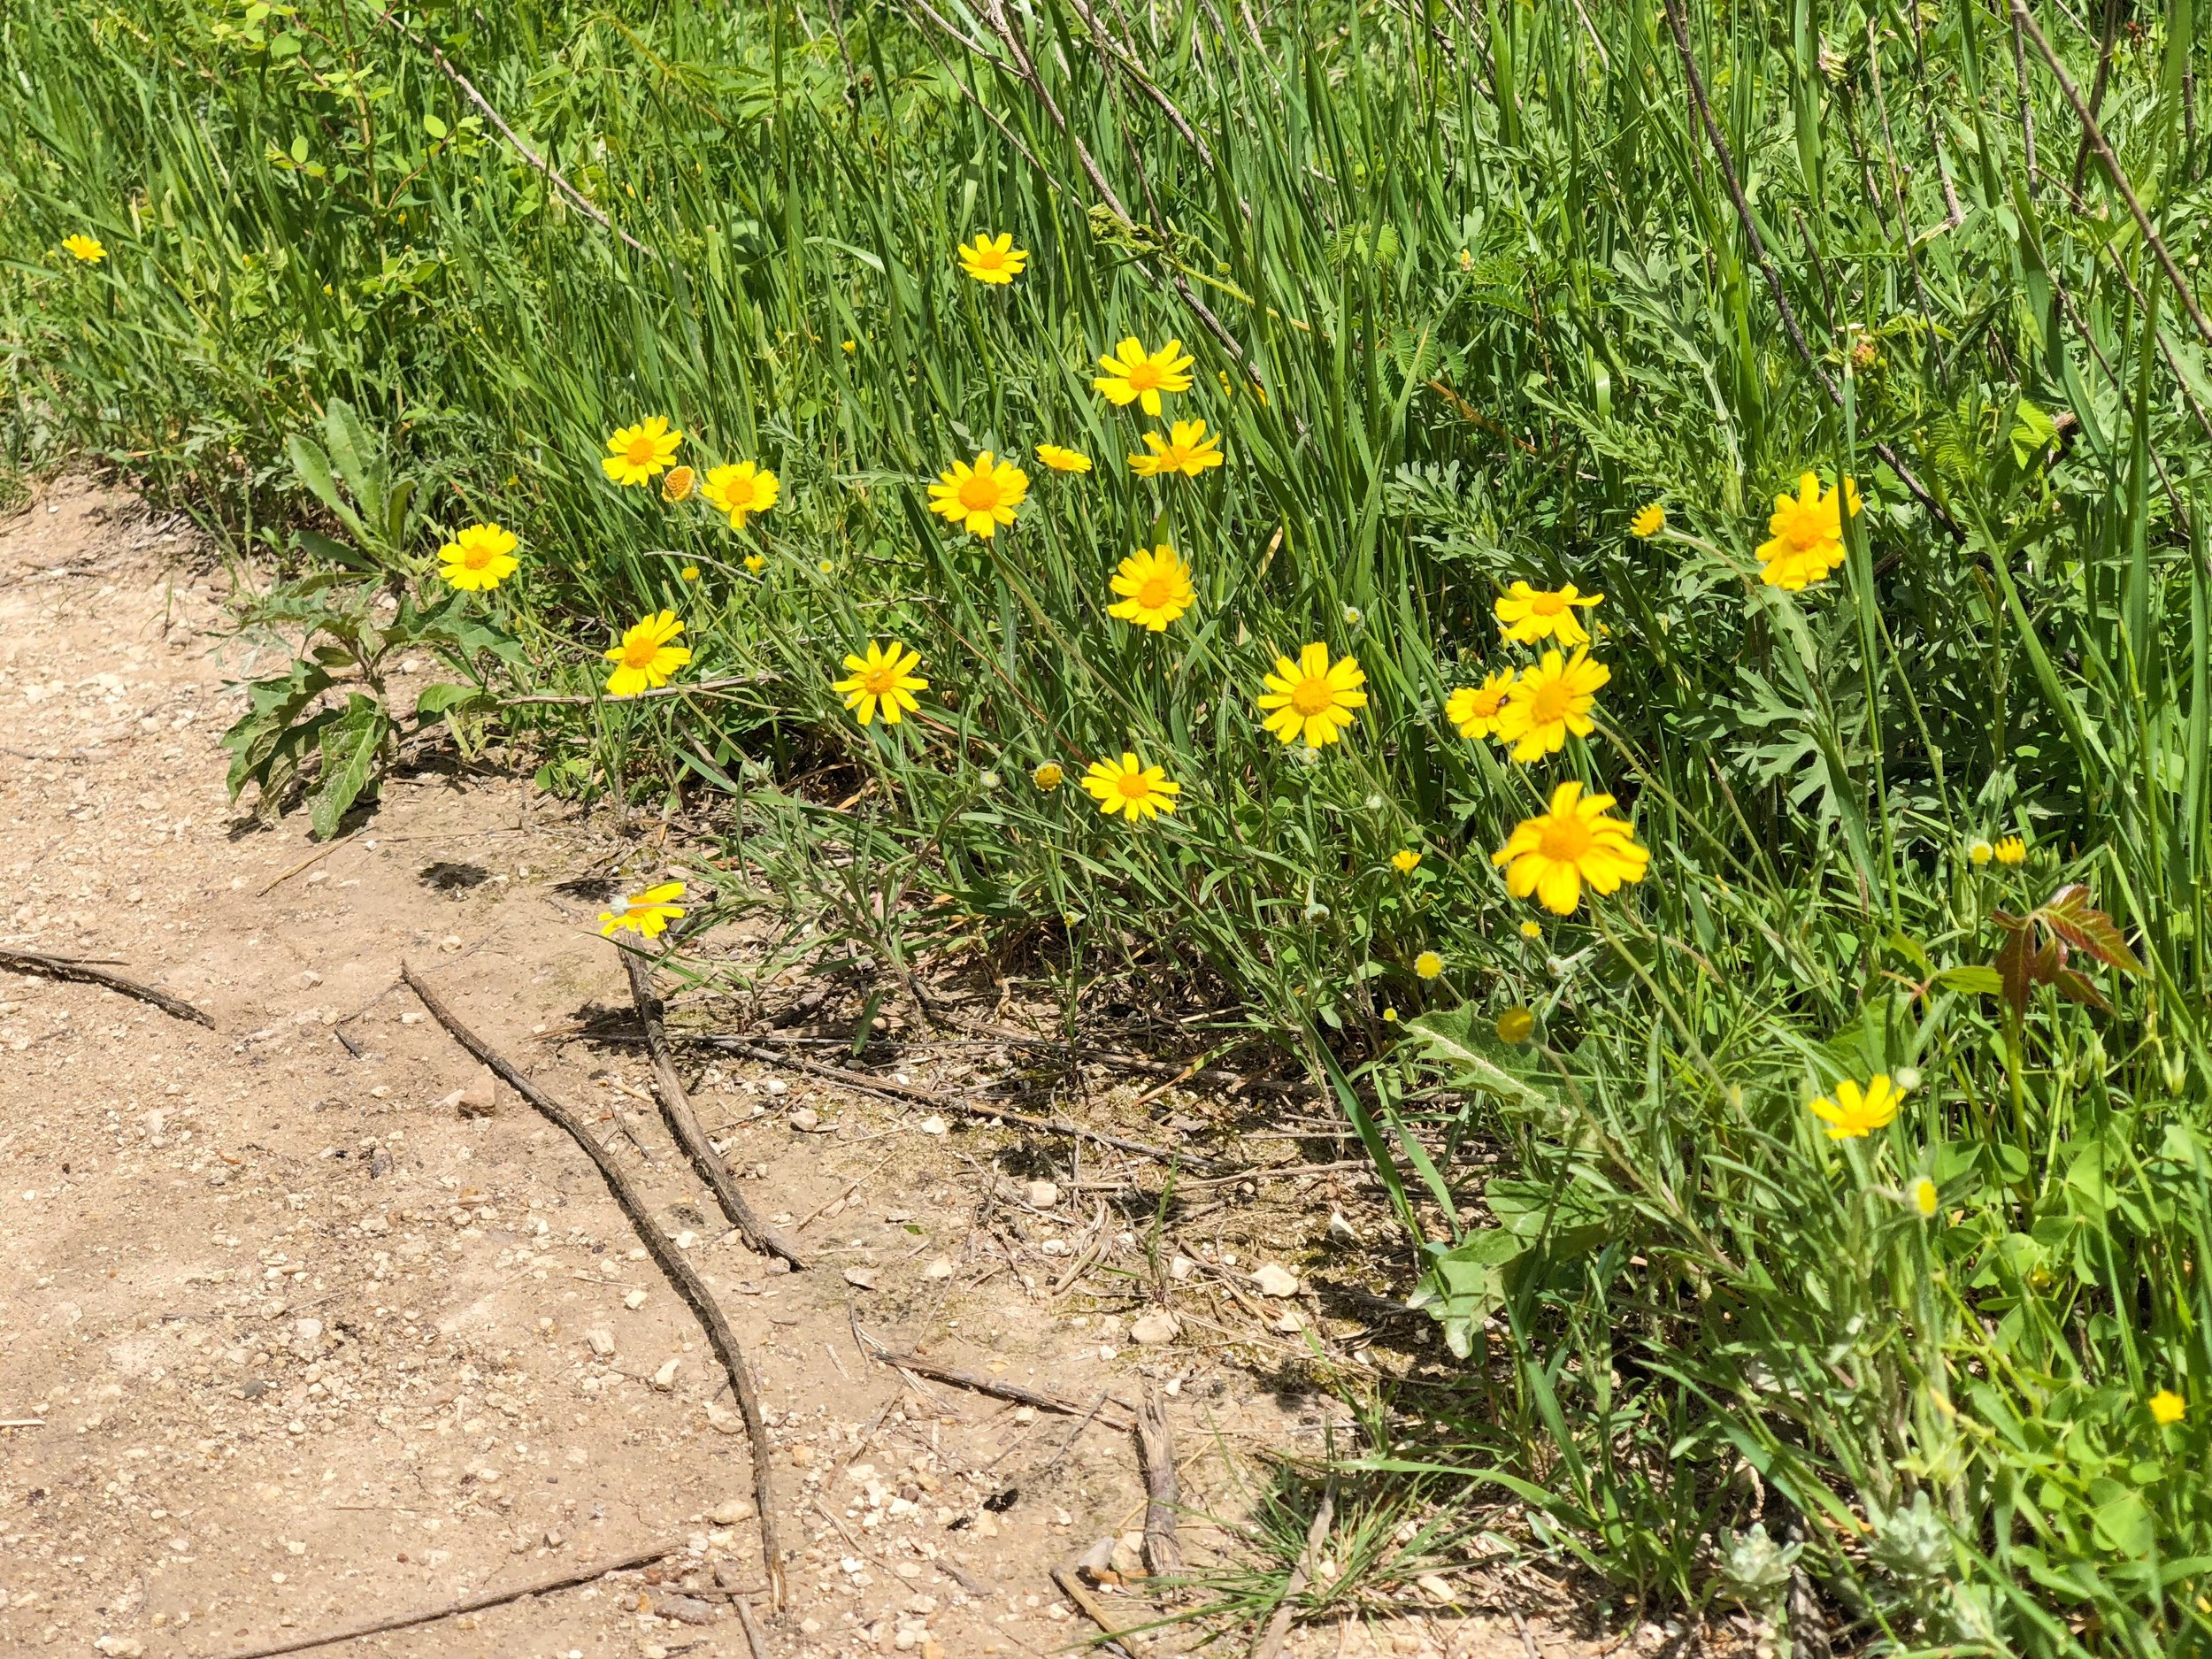 Tetraneuris scaposa var. scaposa, Four nerve daisy